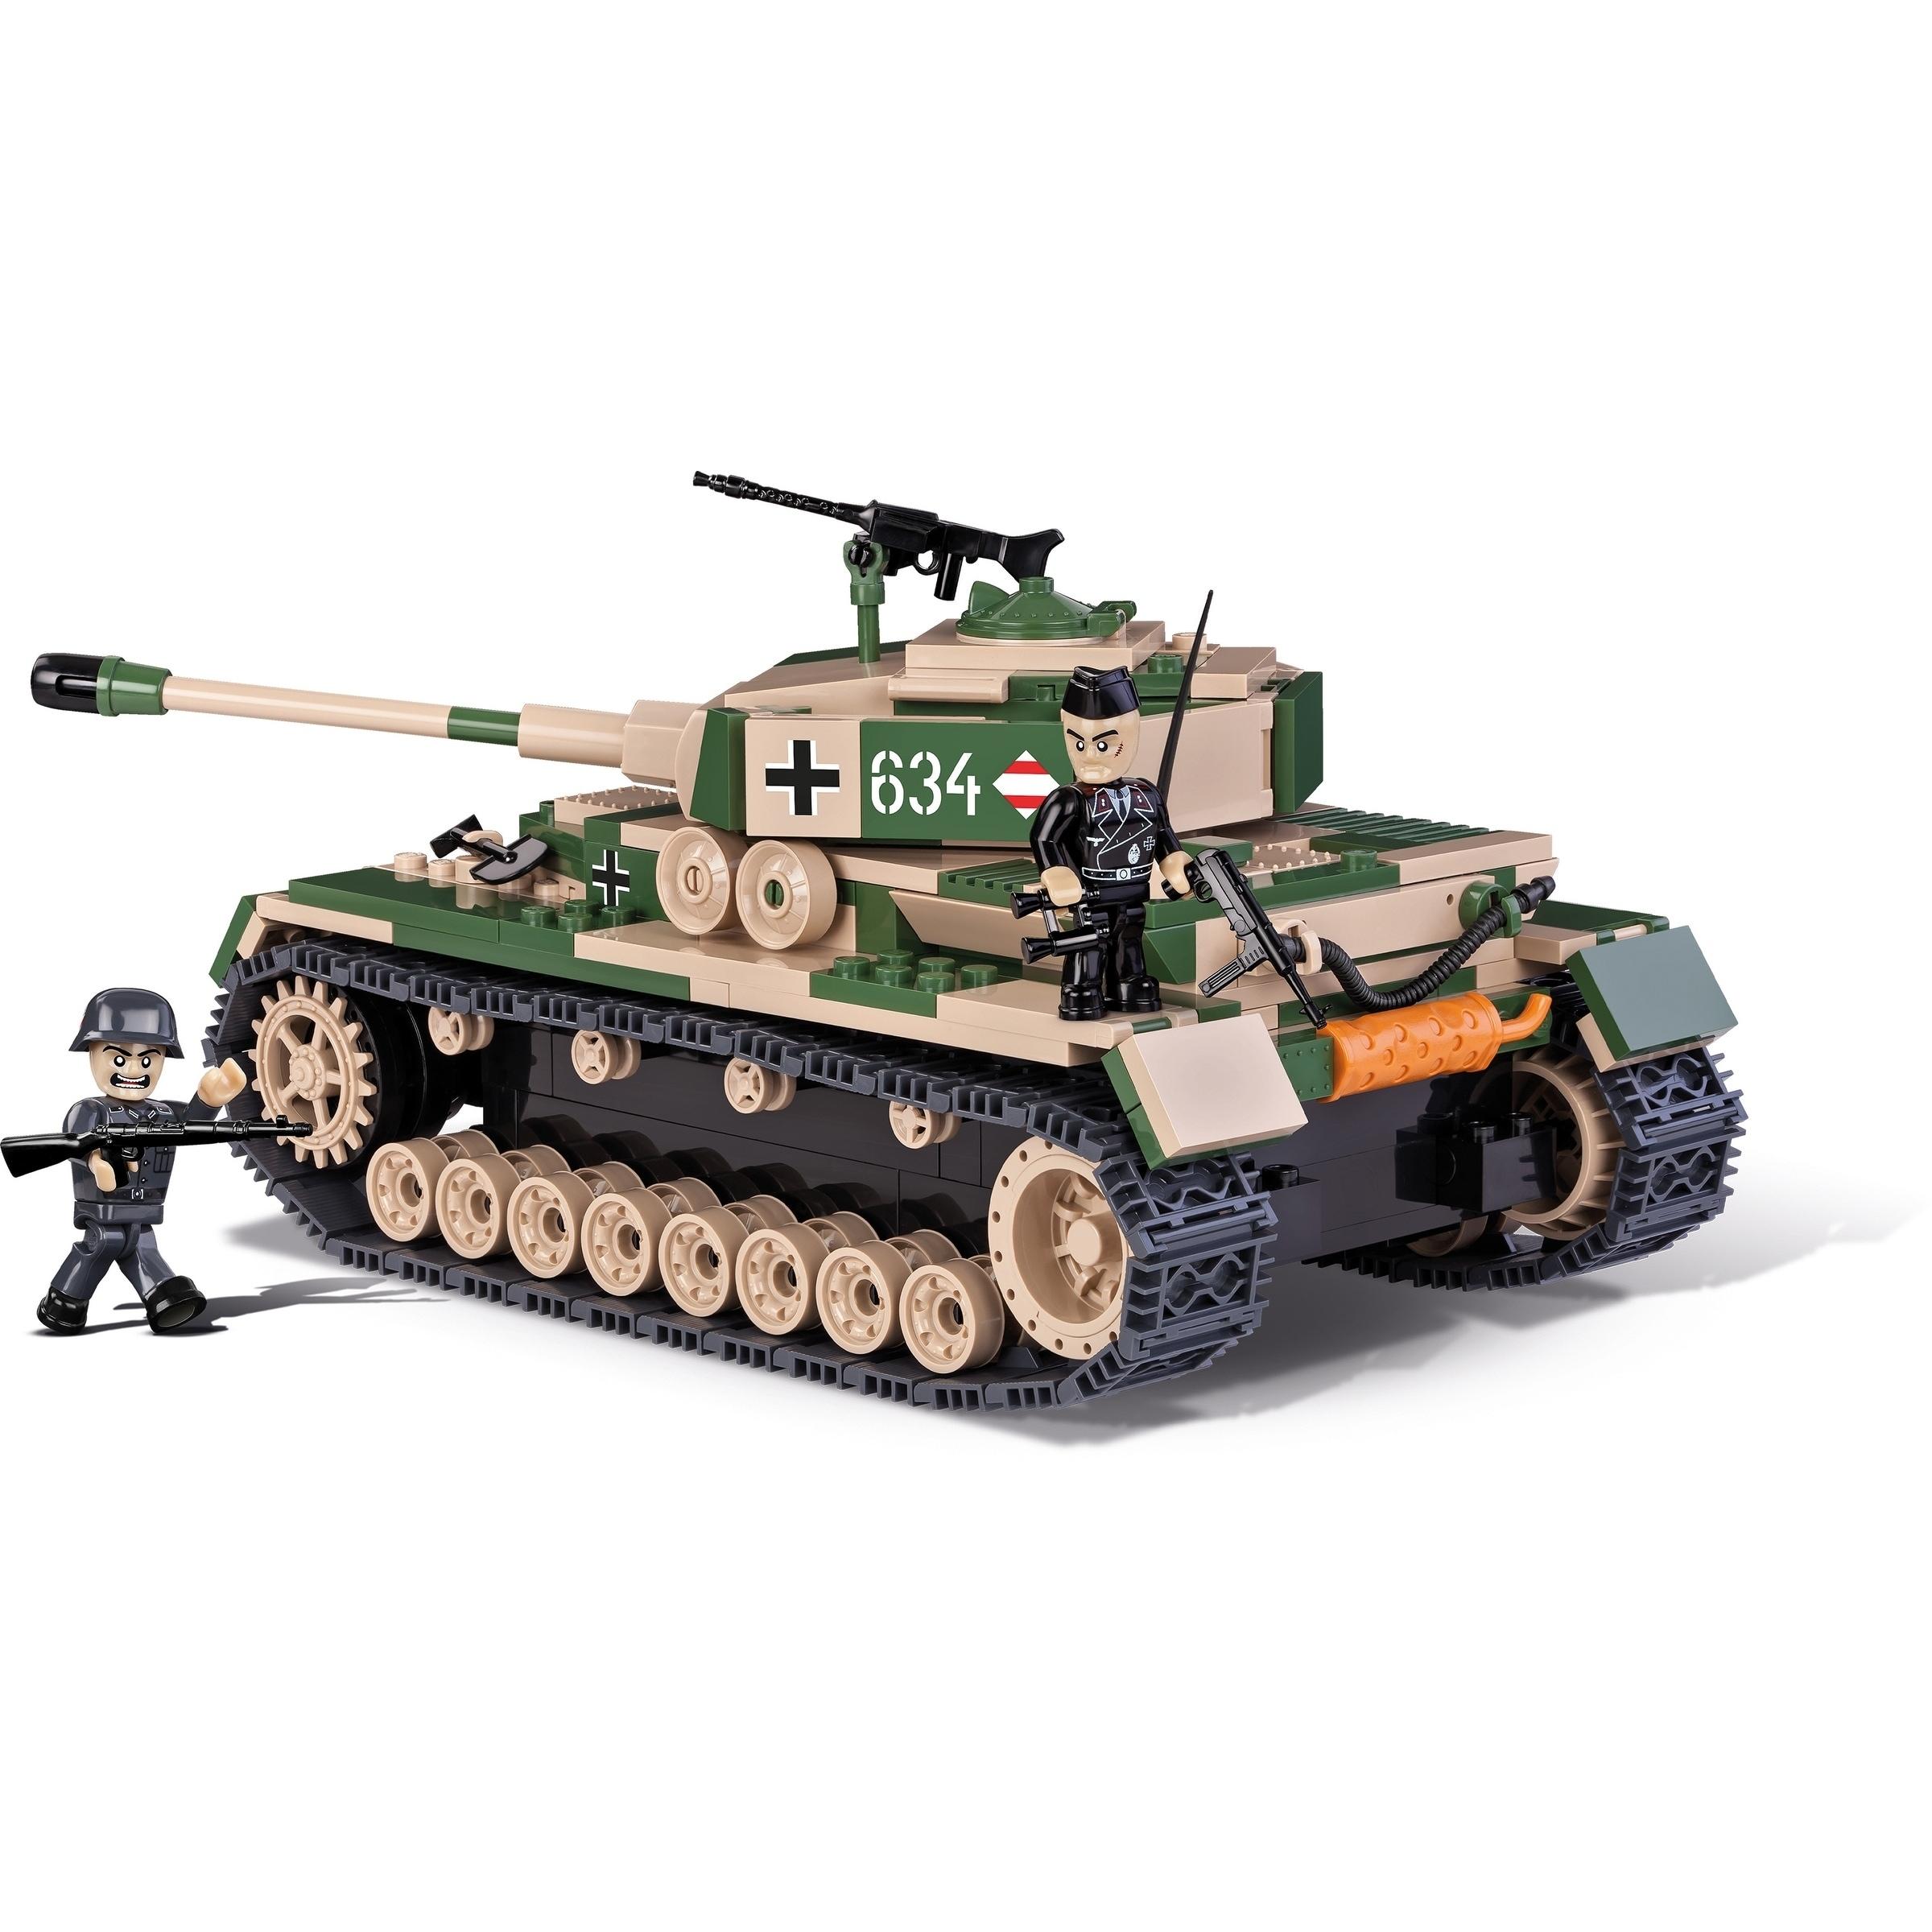 COBI Small Army World War II Panzer IV Ausf  F1/G/H 500 Tank Piece  Construction Blocks Building Kit